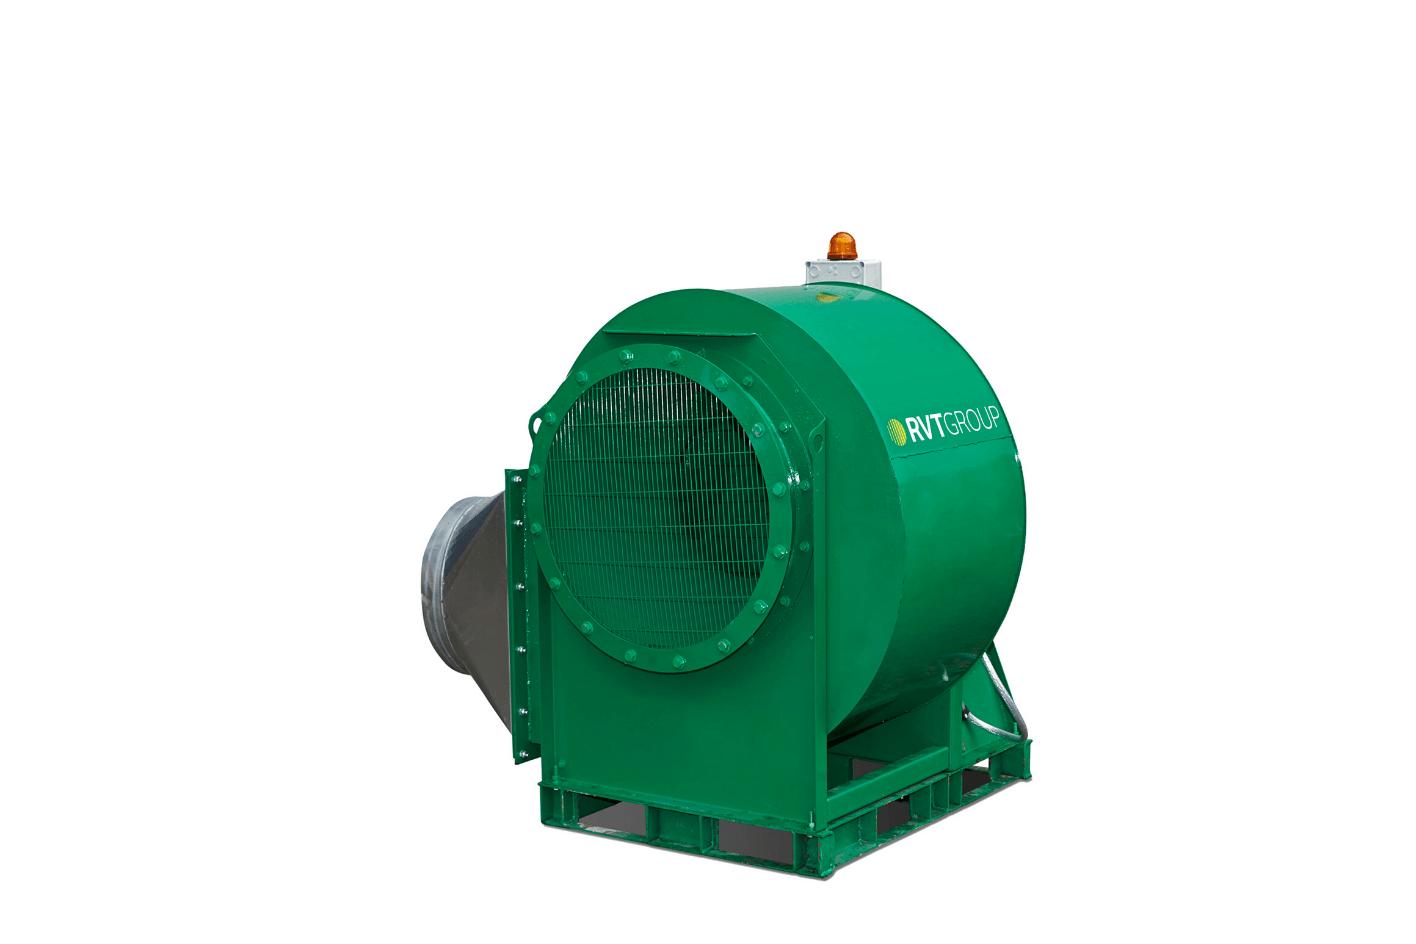 Ventex Centrifual Fan 800 S_Ventilation Equipment